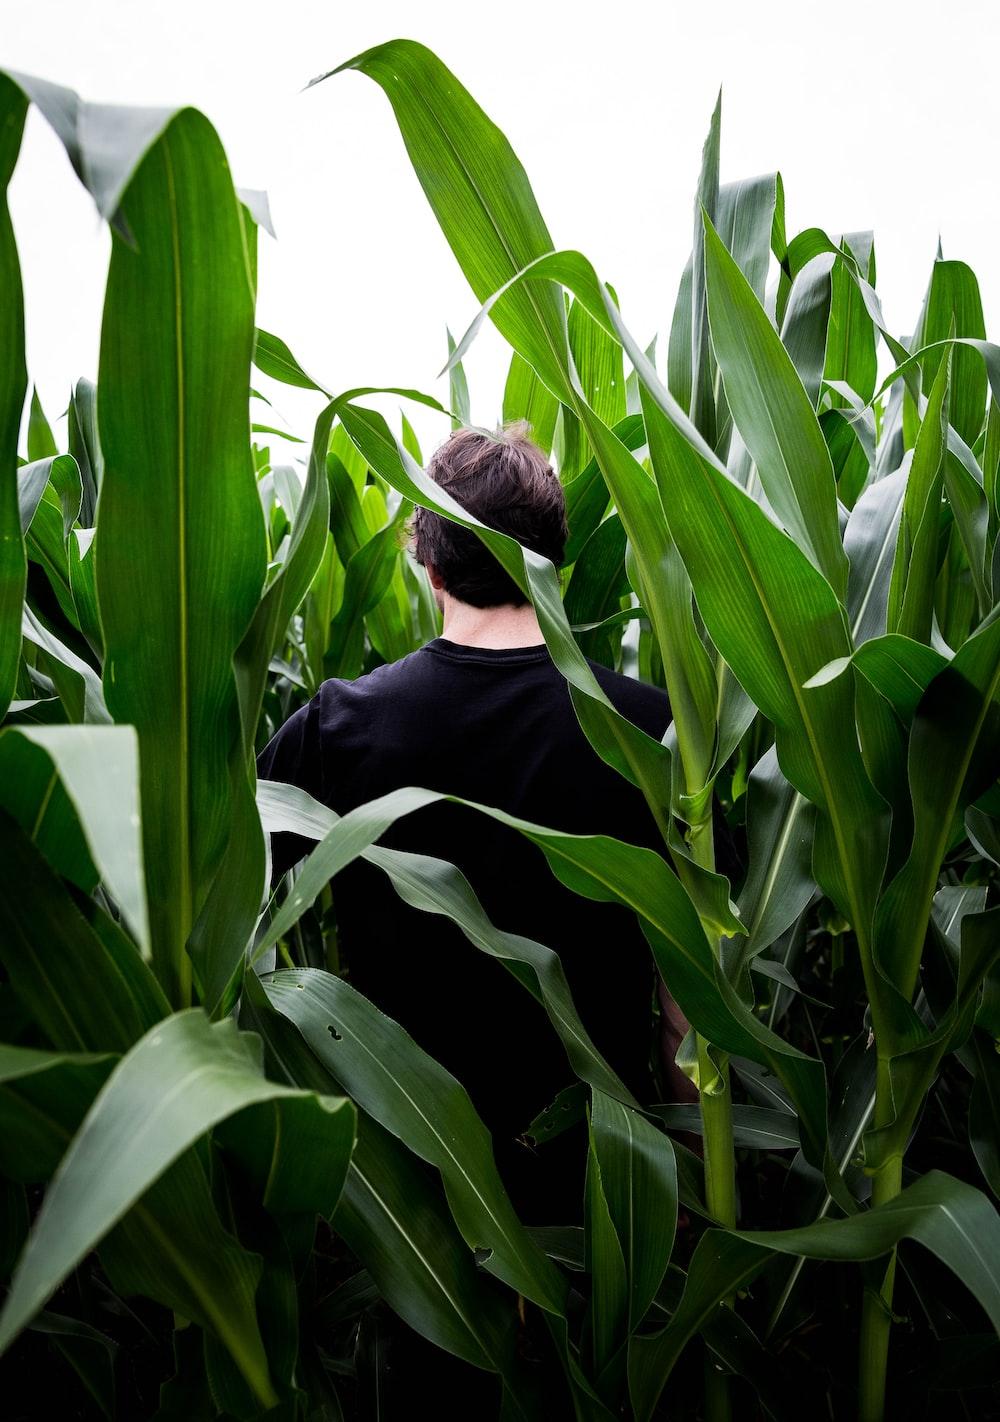 man in black long sleeve shirt standing beside corn plant during daytime